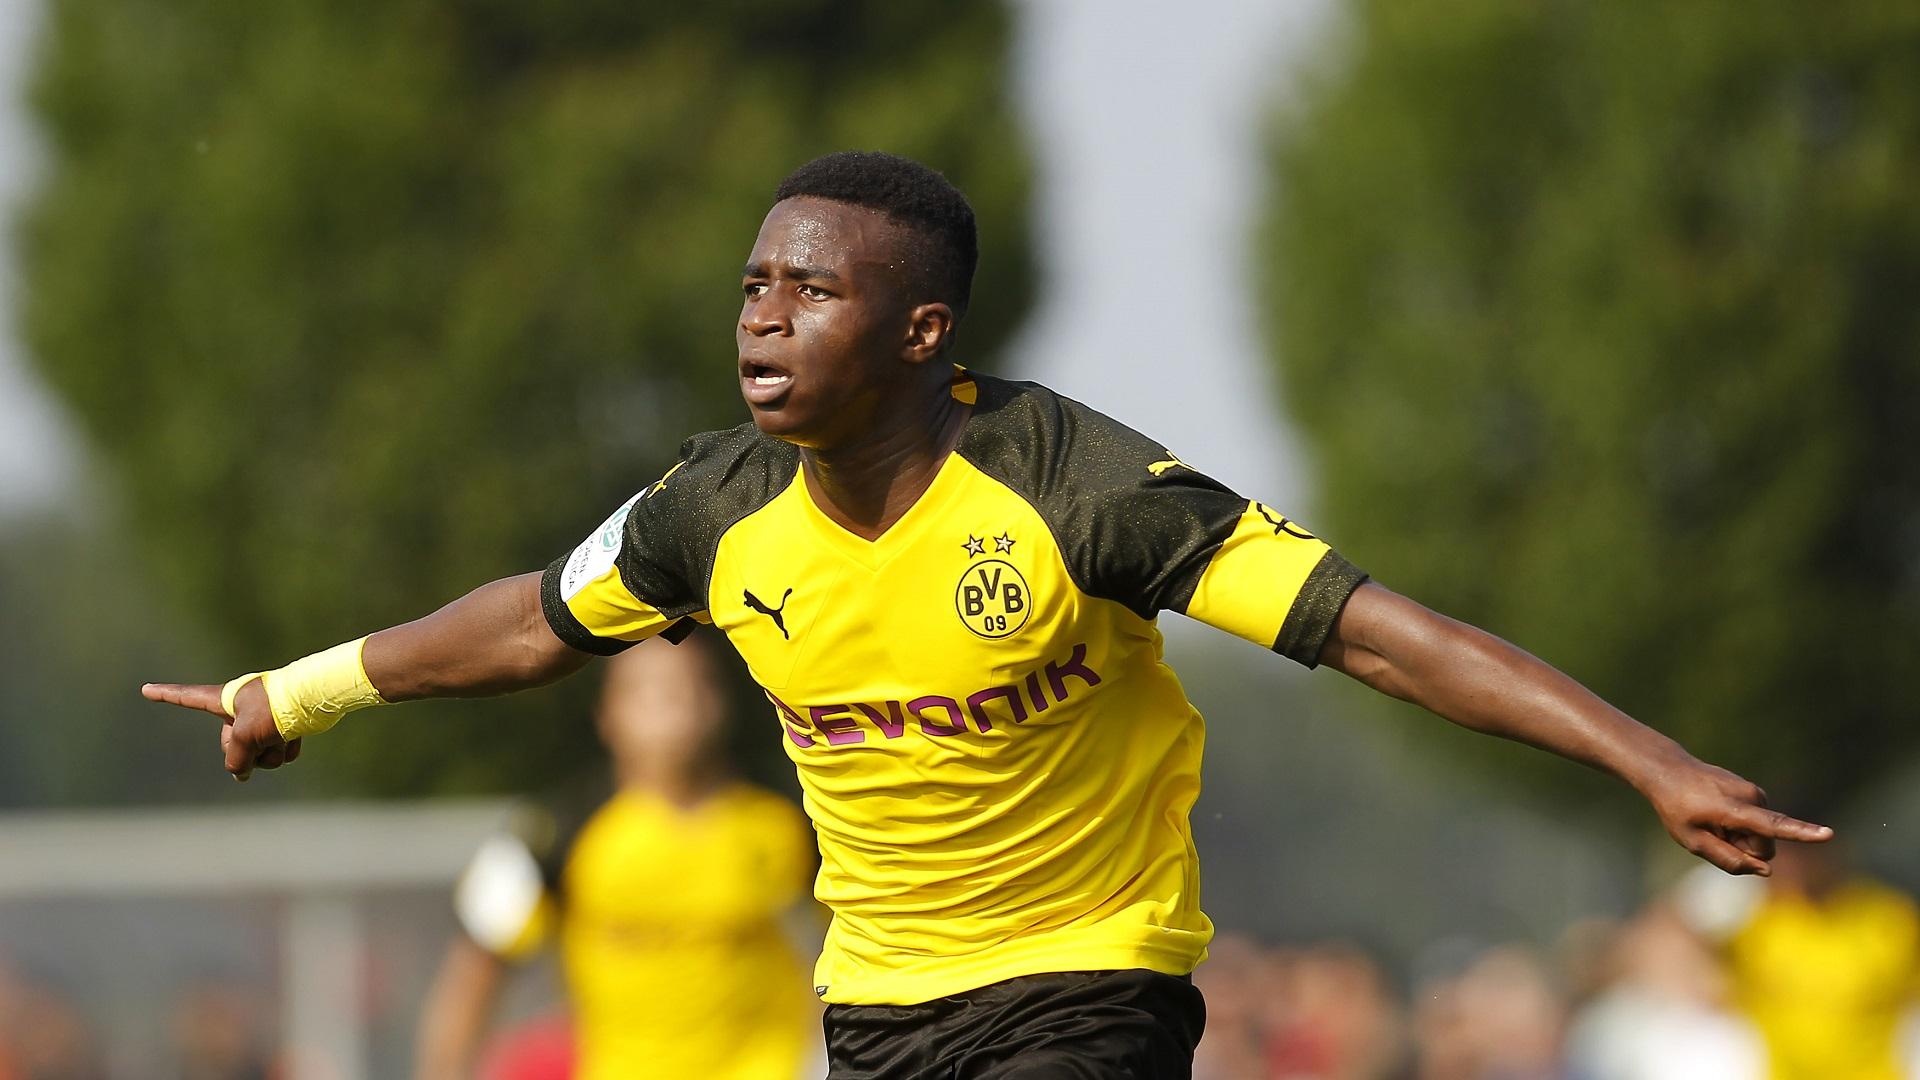 Moukoko 'deserves' Bundesliga chance, says Dortmund youth boss